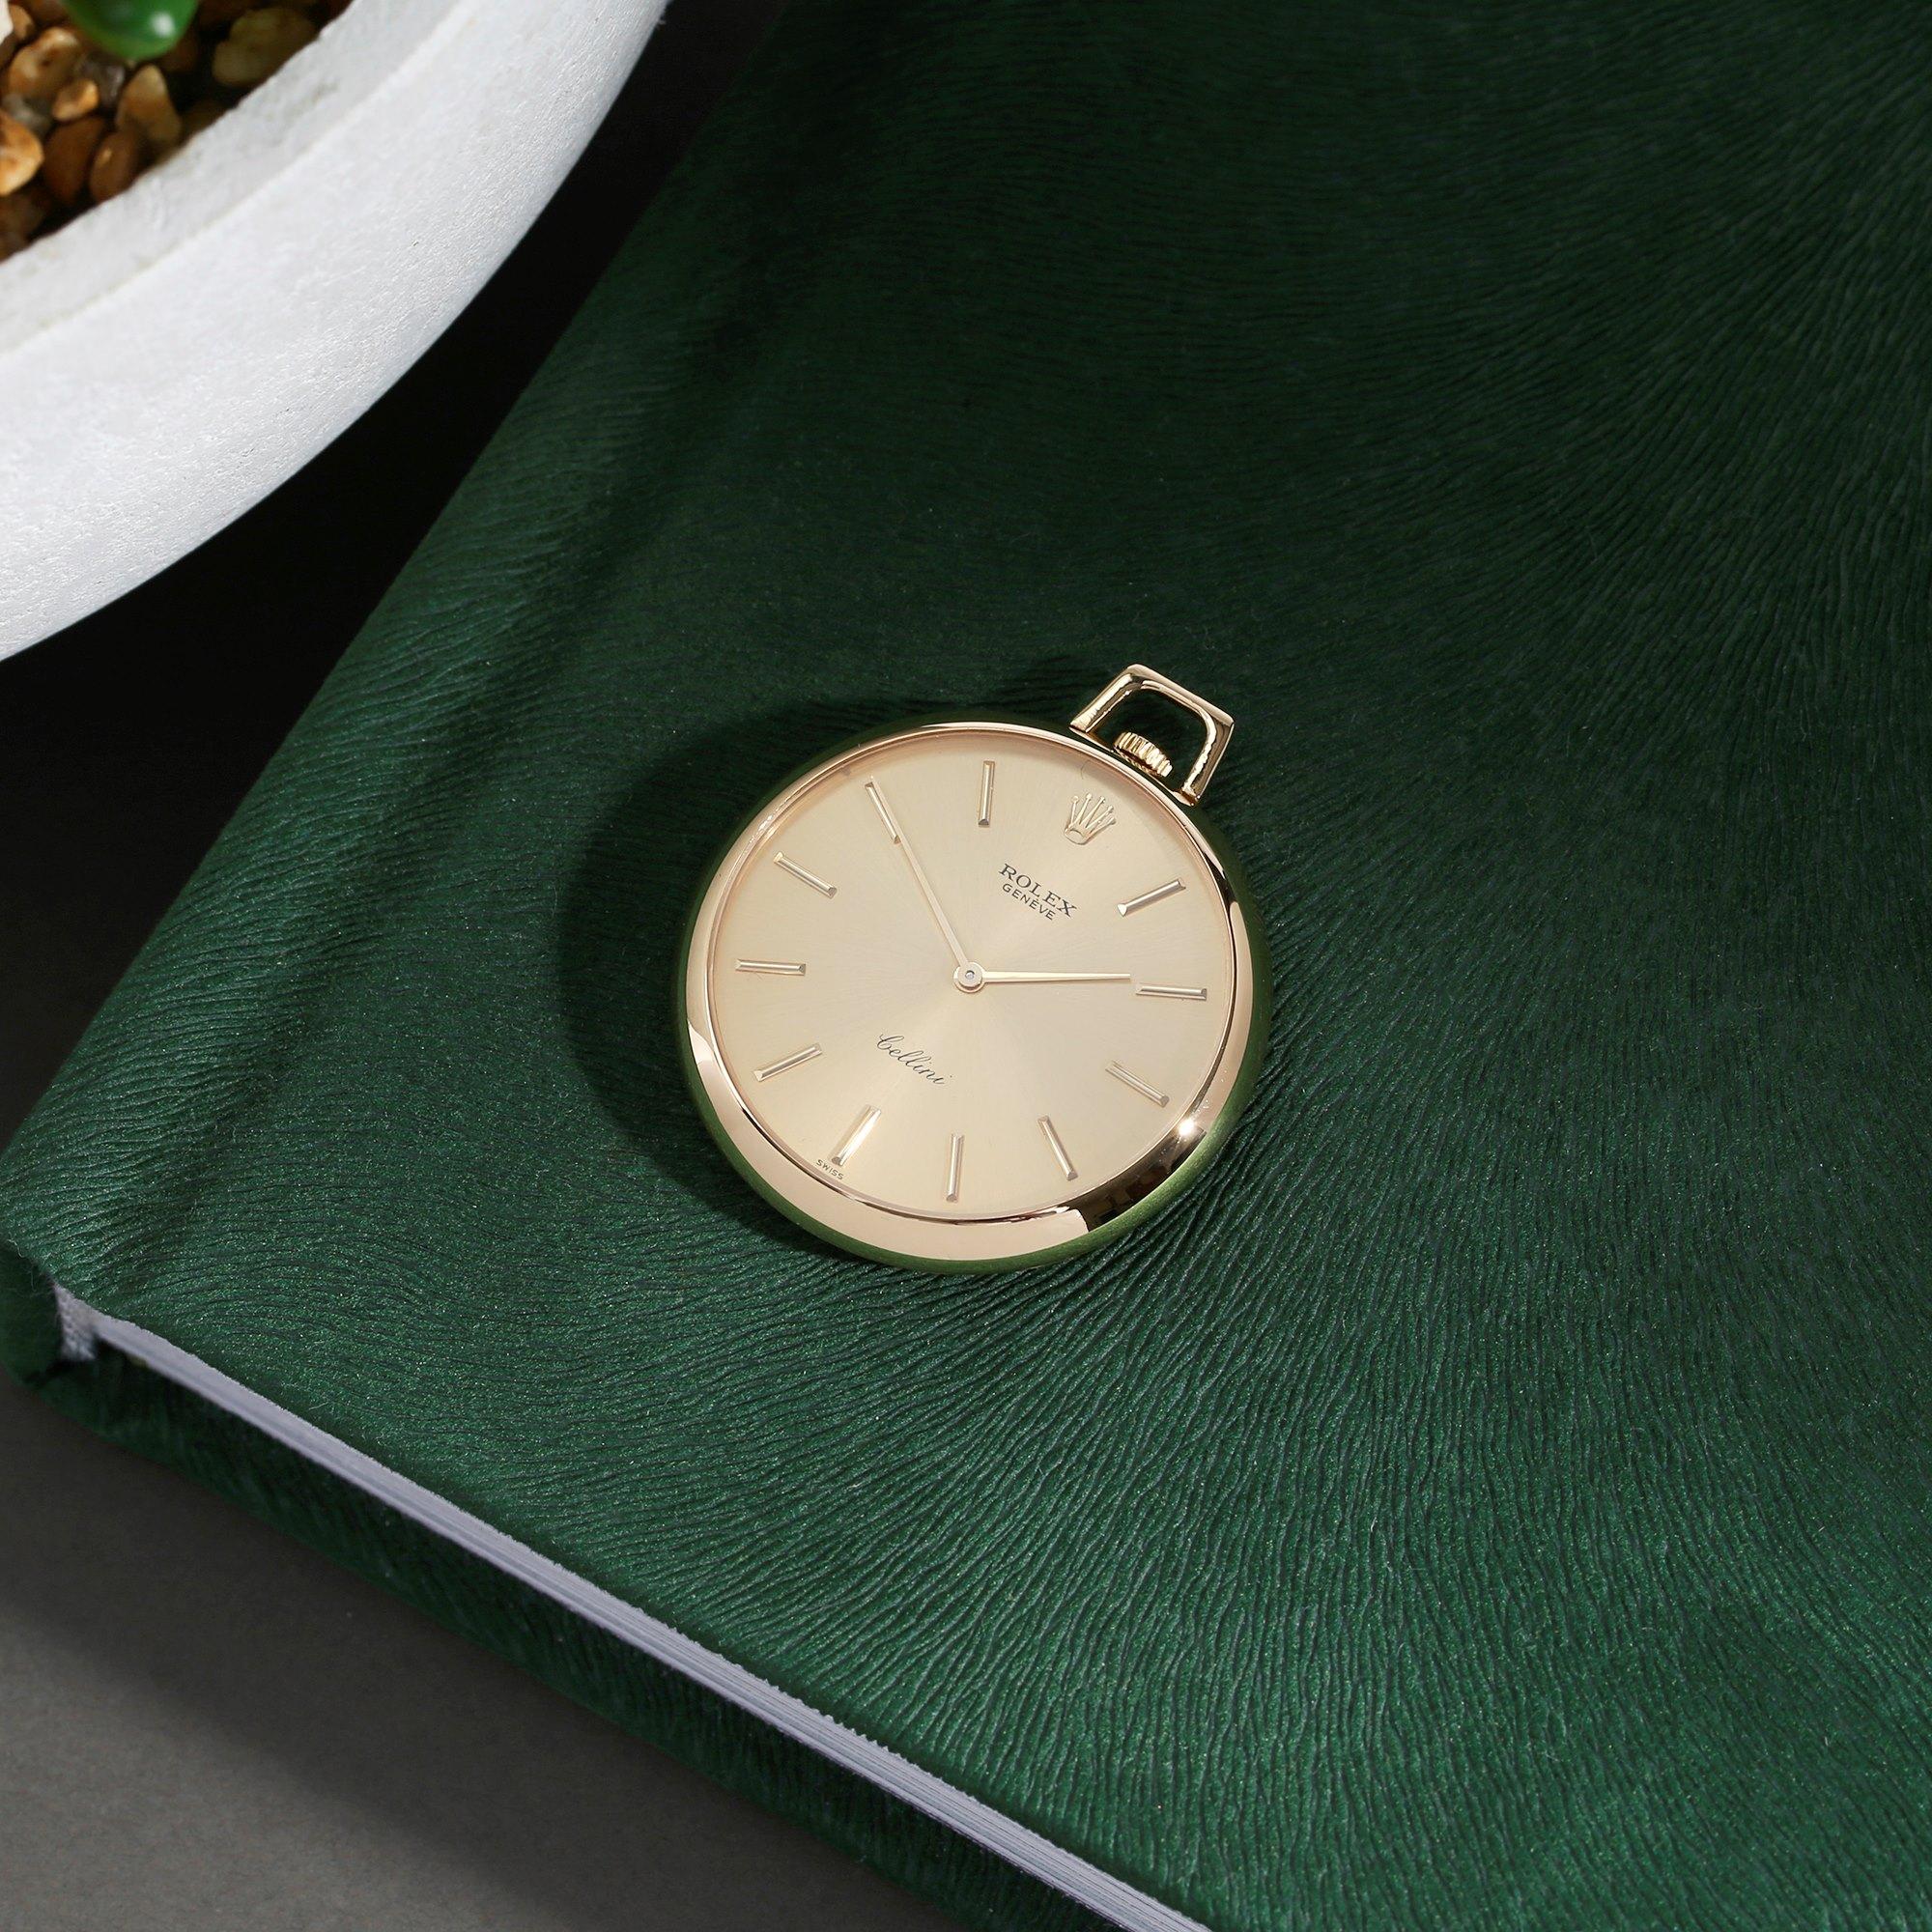 Rolex Cellini Pocket Watch Calibre 1600 18K Yellow Gold 3717